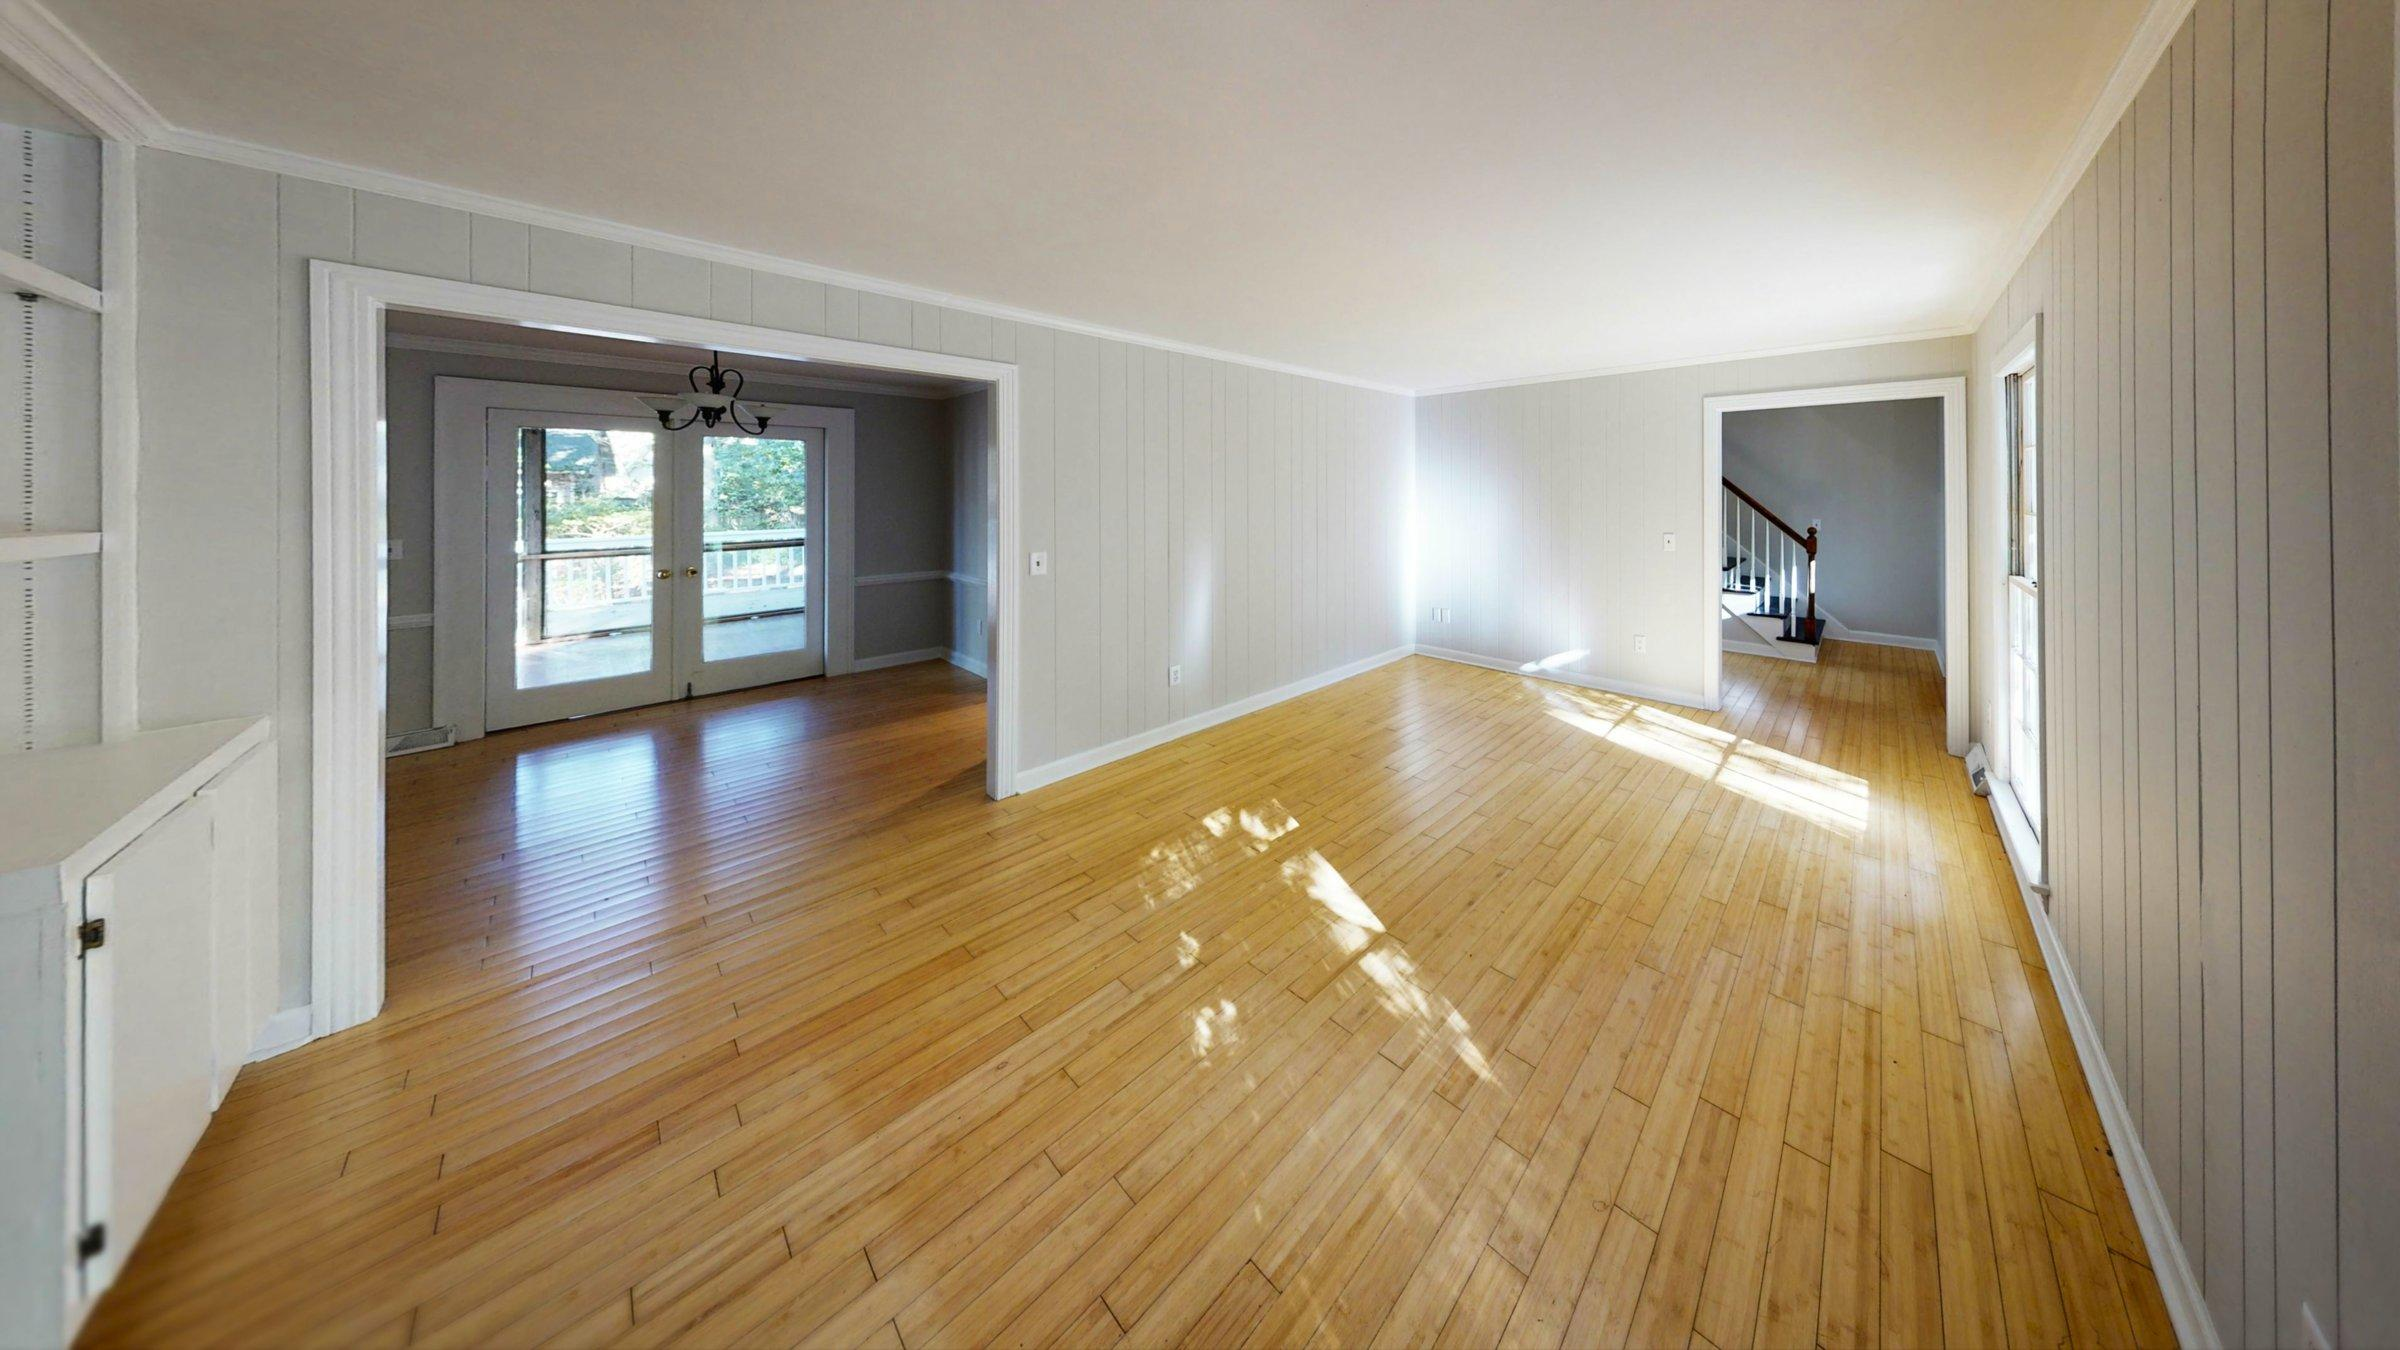 Snee Farm Homes For Sale - 1168 Parkway, Mount Pleasant, SC - 0